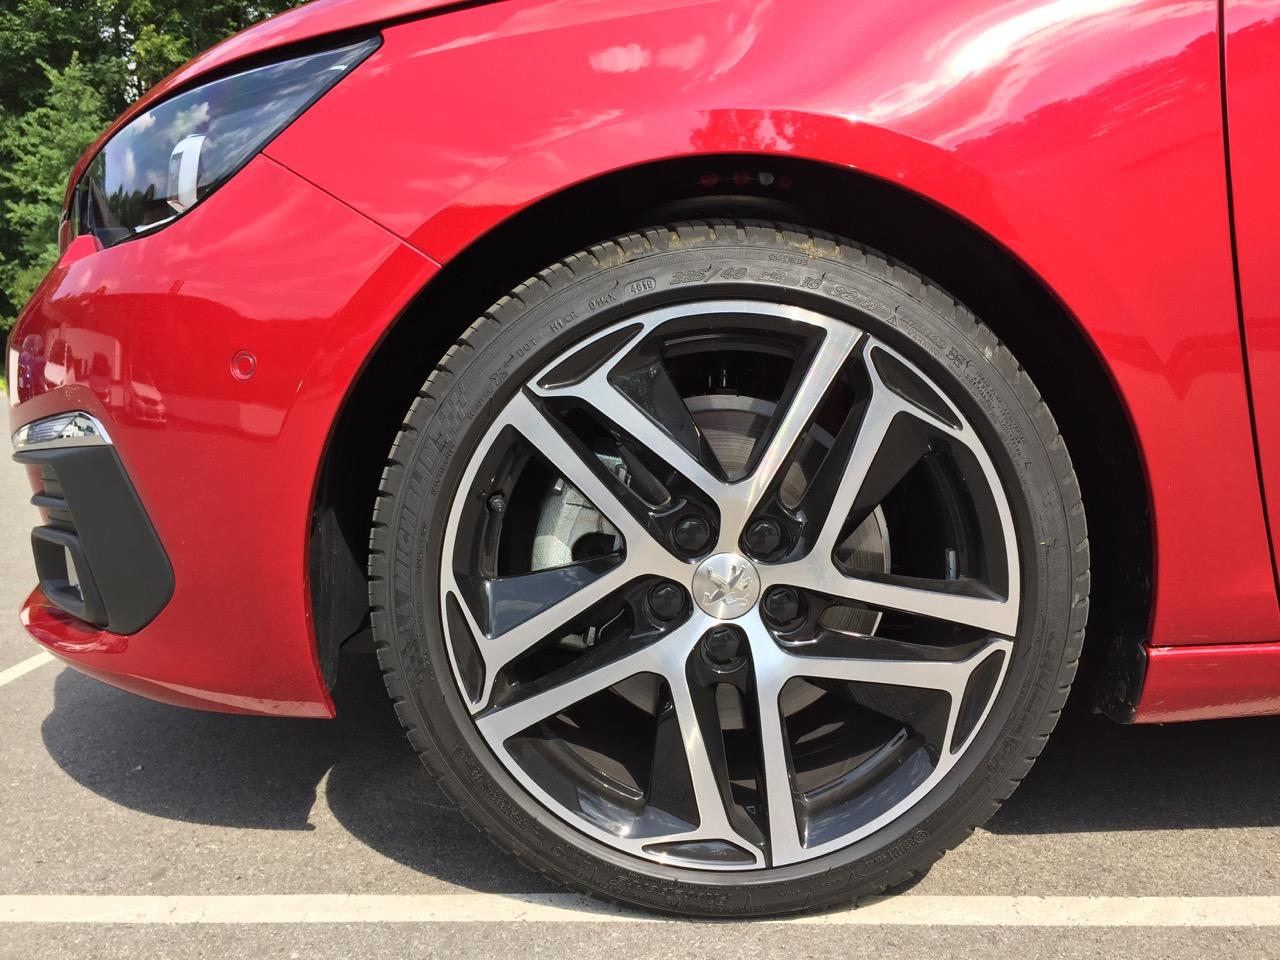 Nuova Peugeot 308 - Test drive